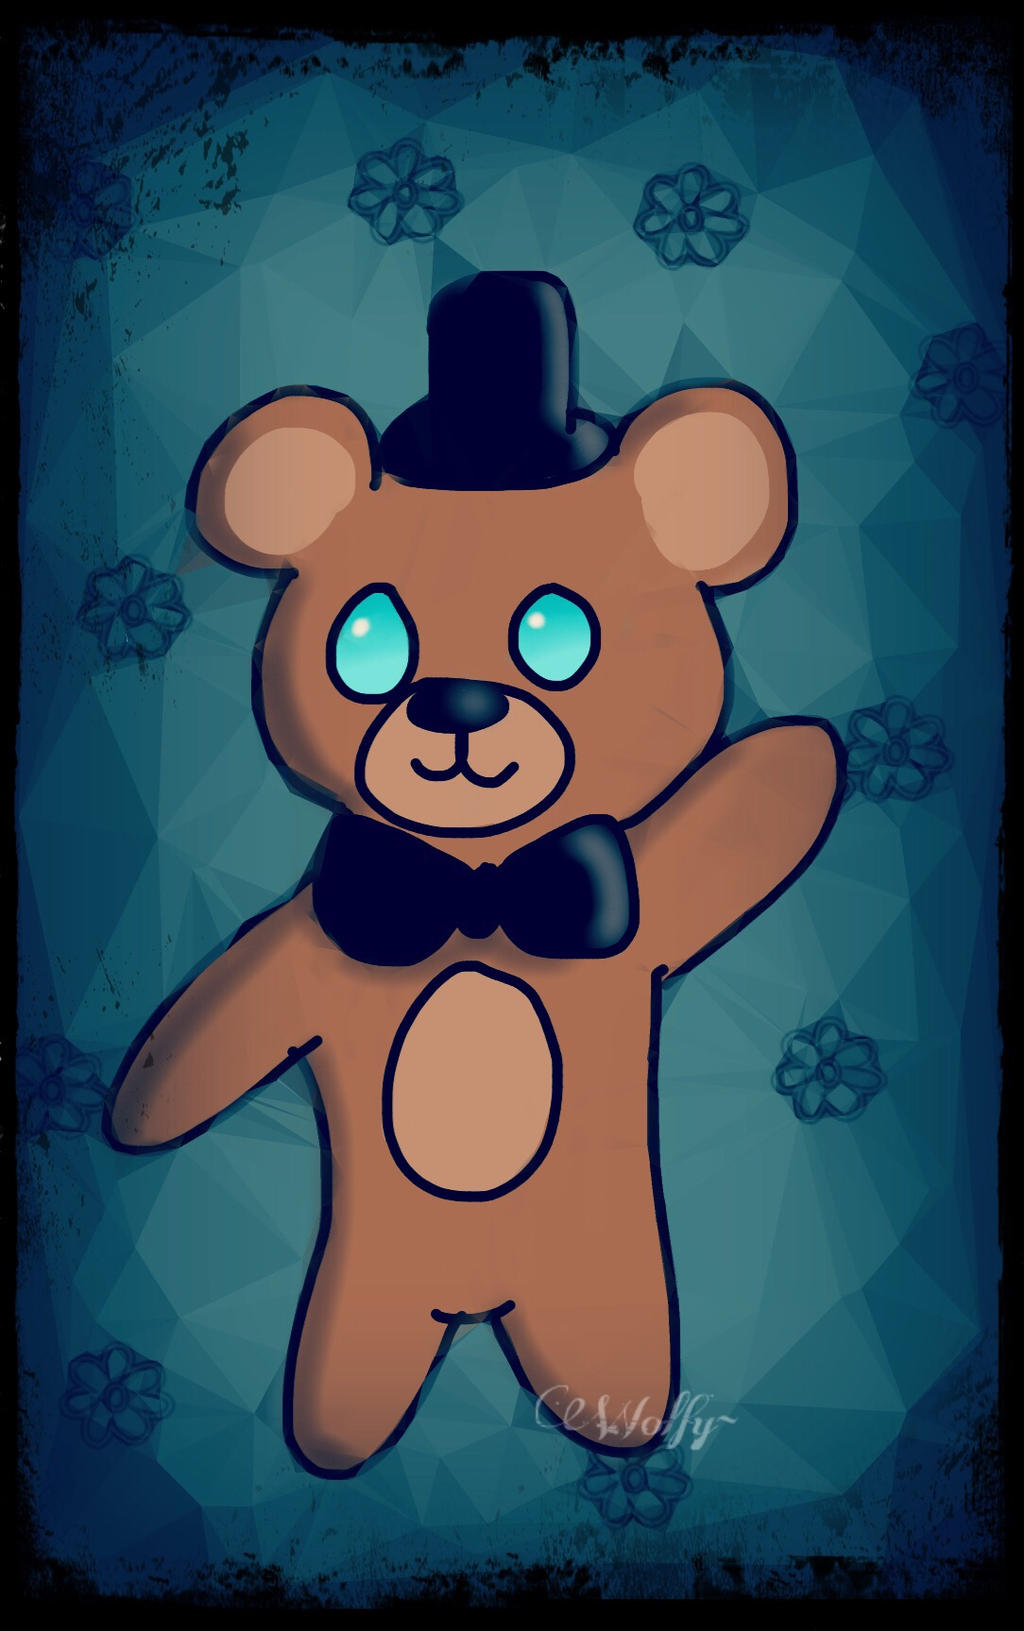 Freddy by Pinkwolfly